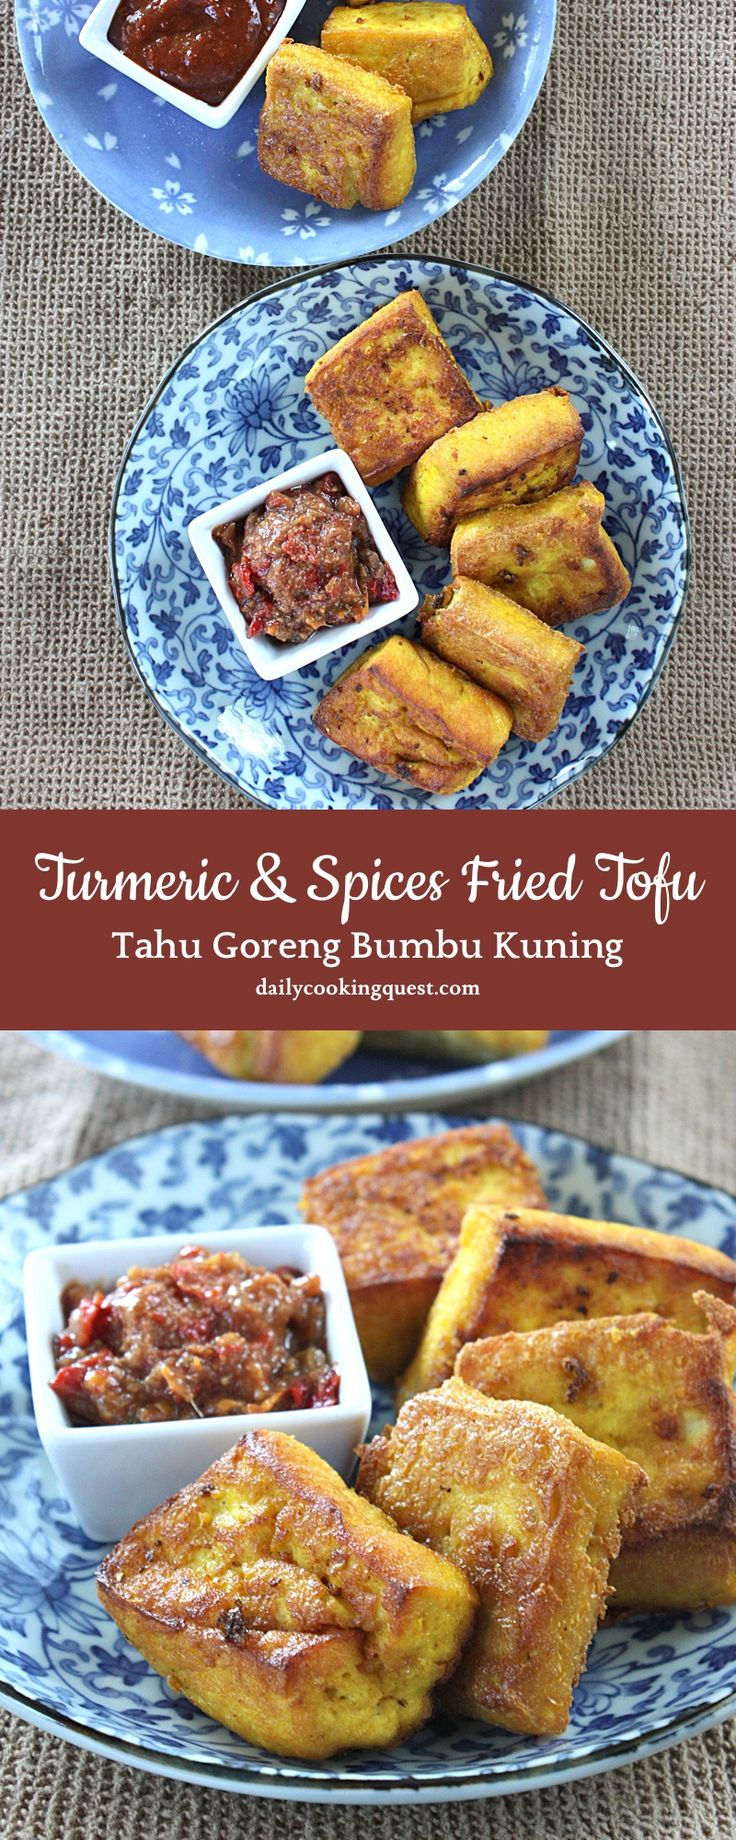 Turmeric and Spices Fried Tofu (Indonesian: Tahu Goreng Bumbu Kuning)